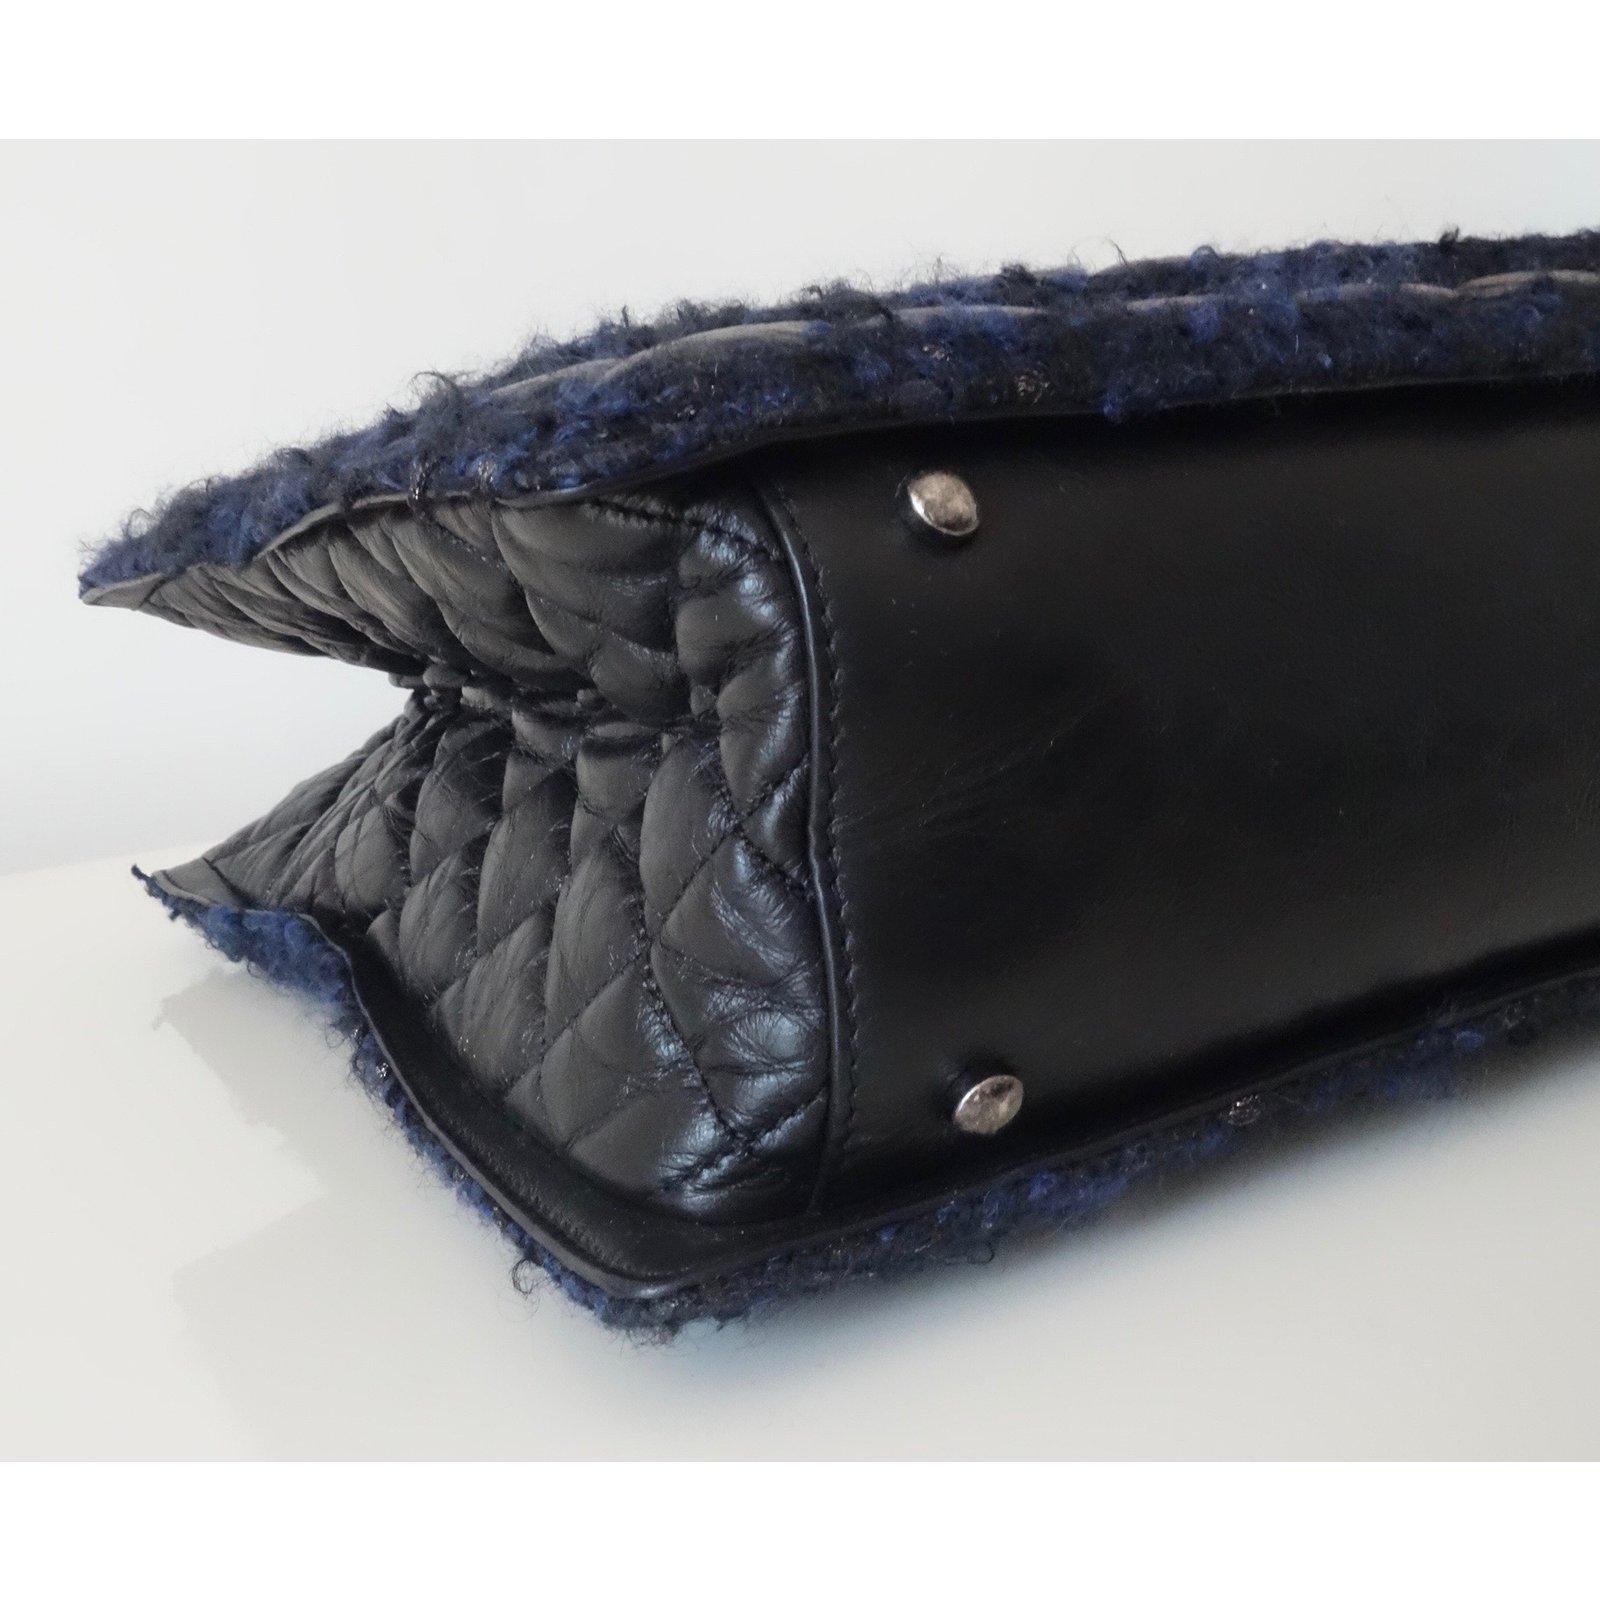 059dd807cd3b Chanel Handbags Handbags Leather,Tweed Navy blue ref.78486 - Joli Closet